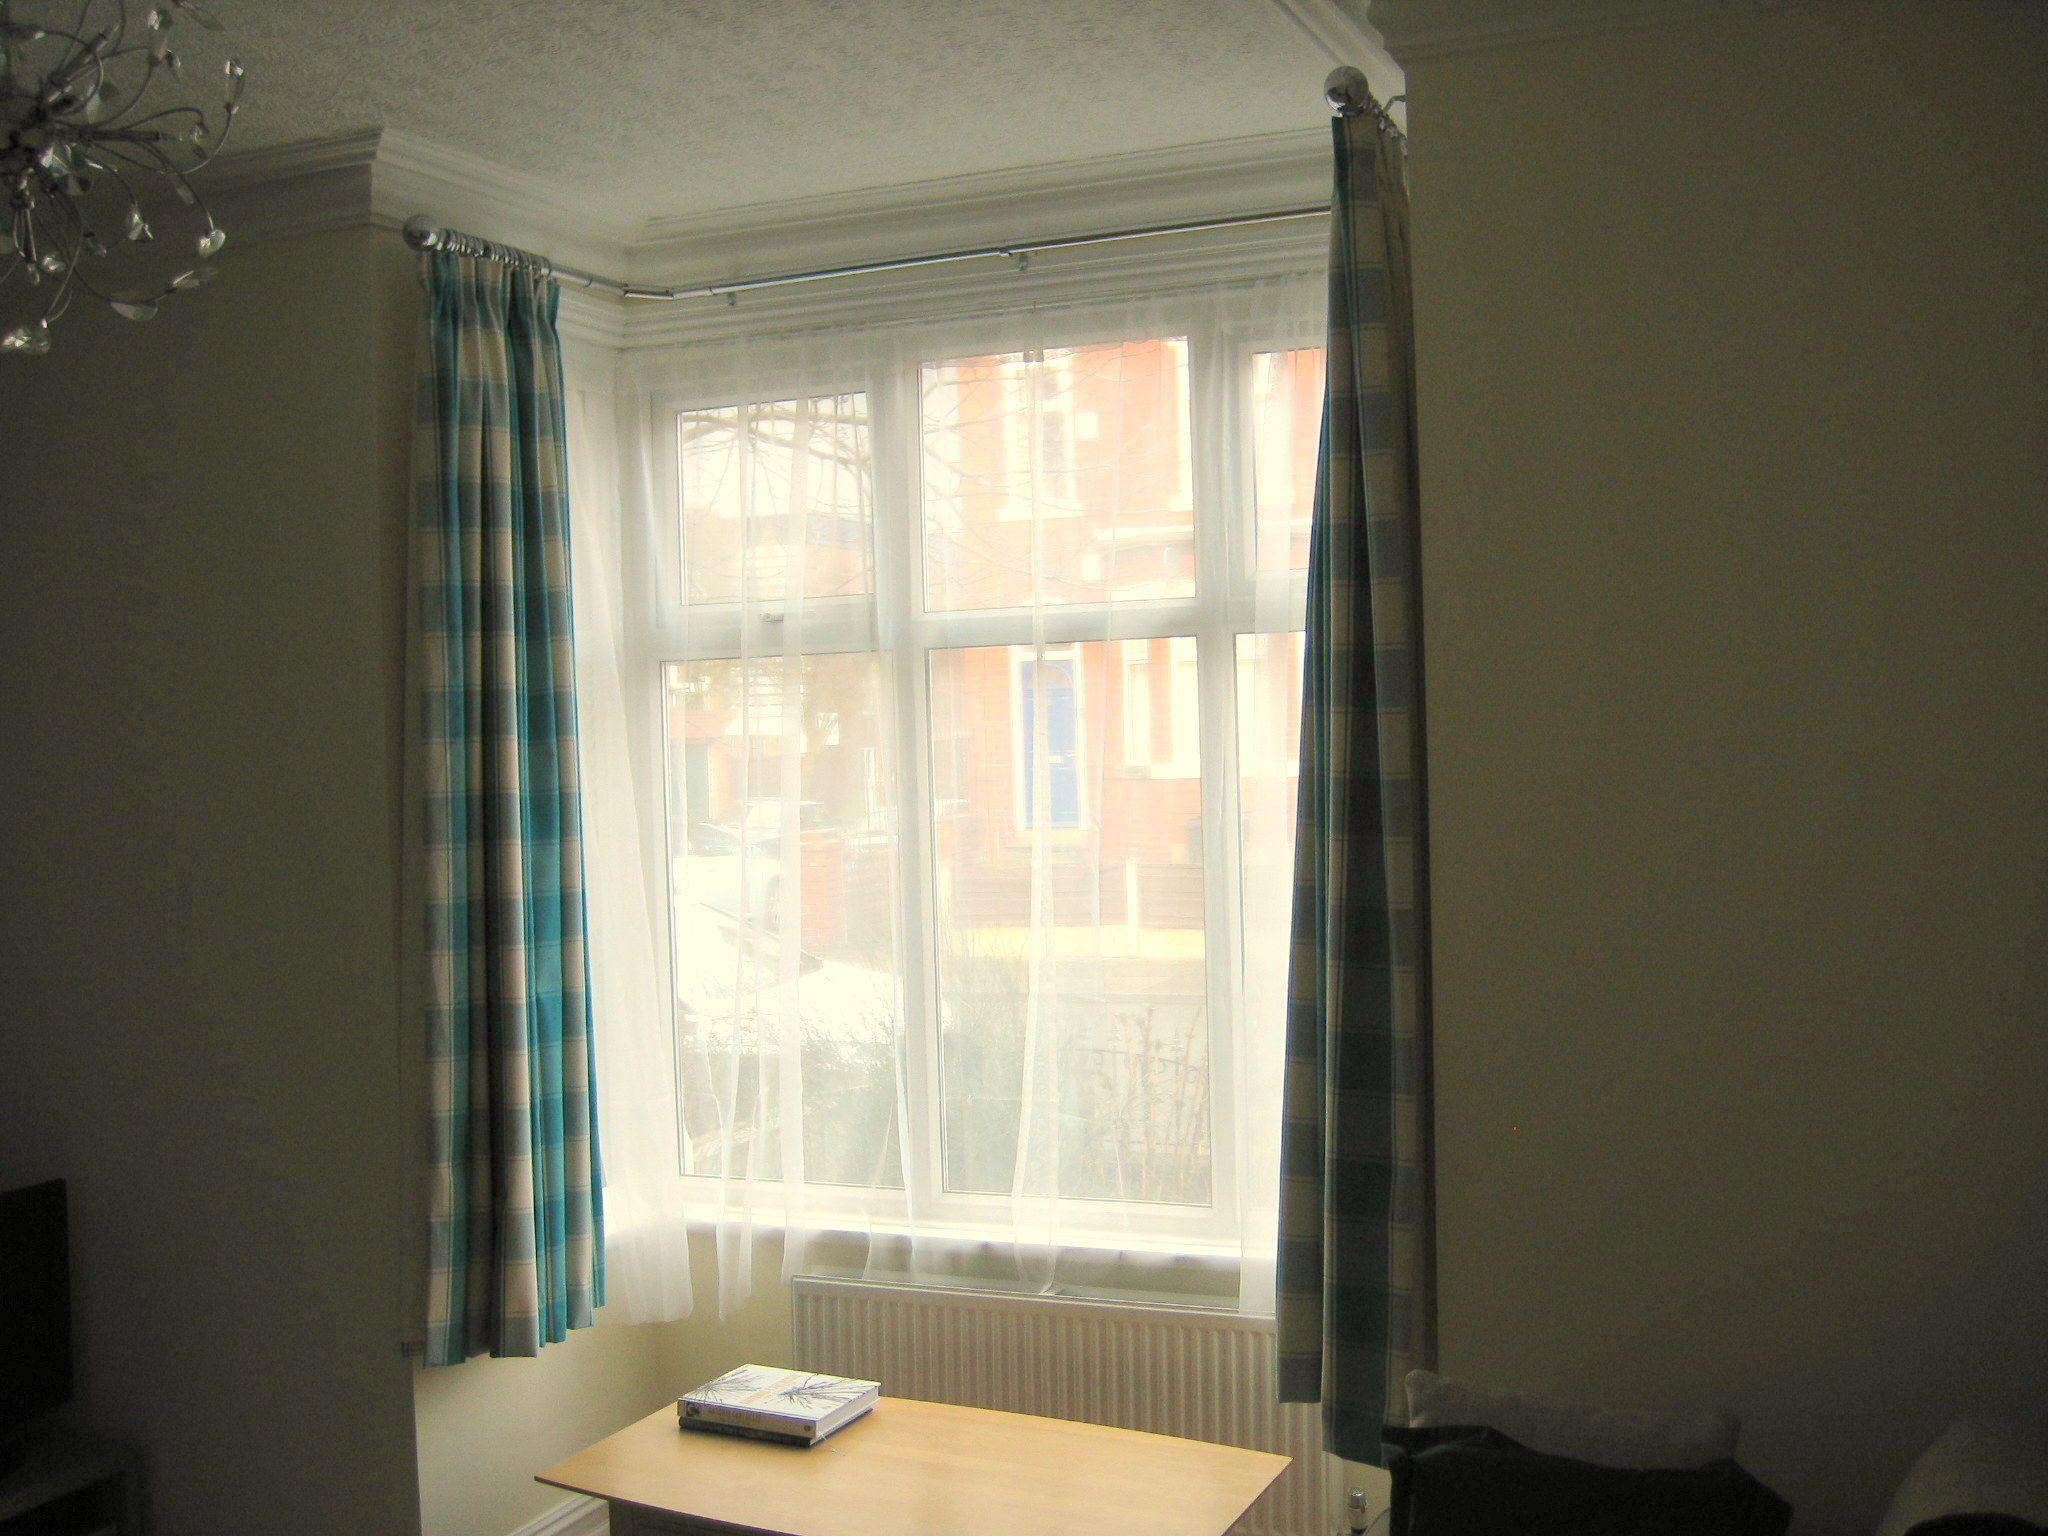 box window square windows curtains